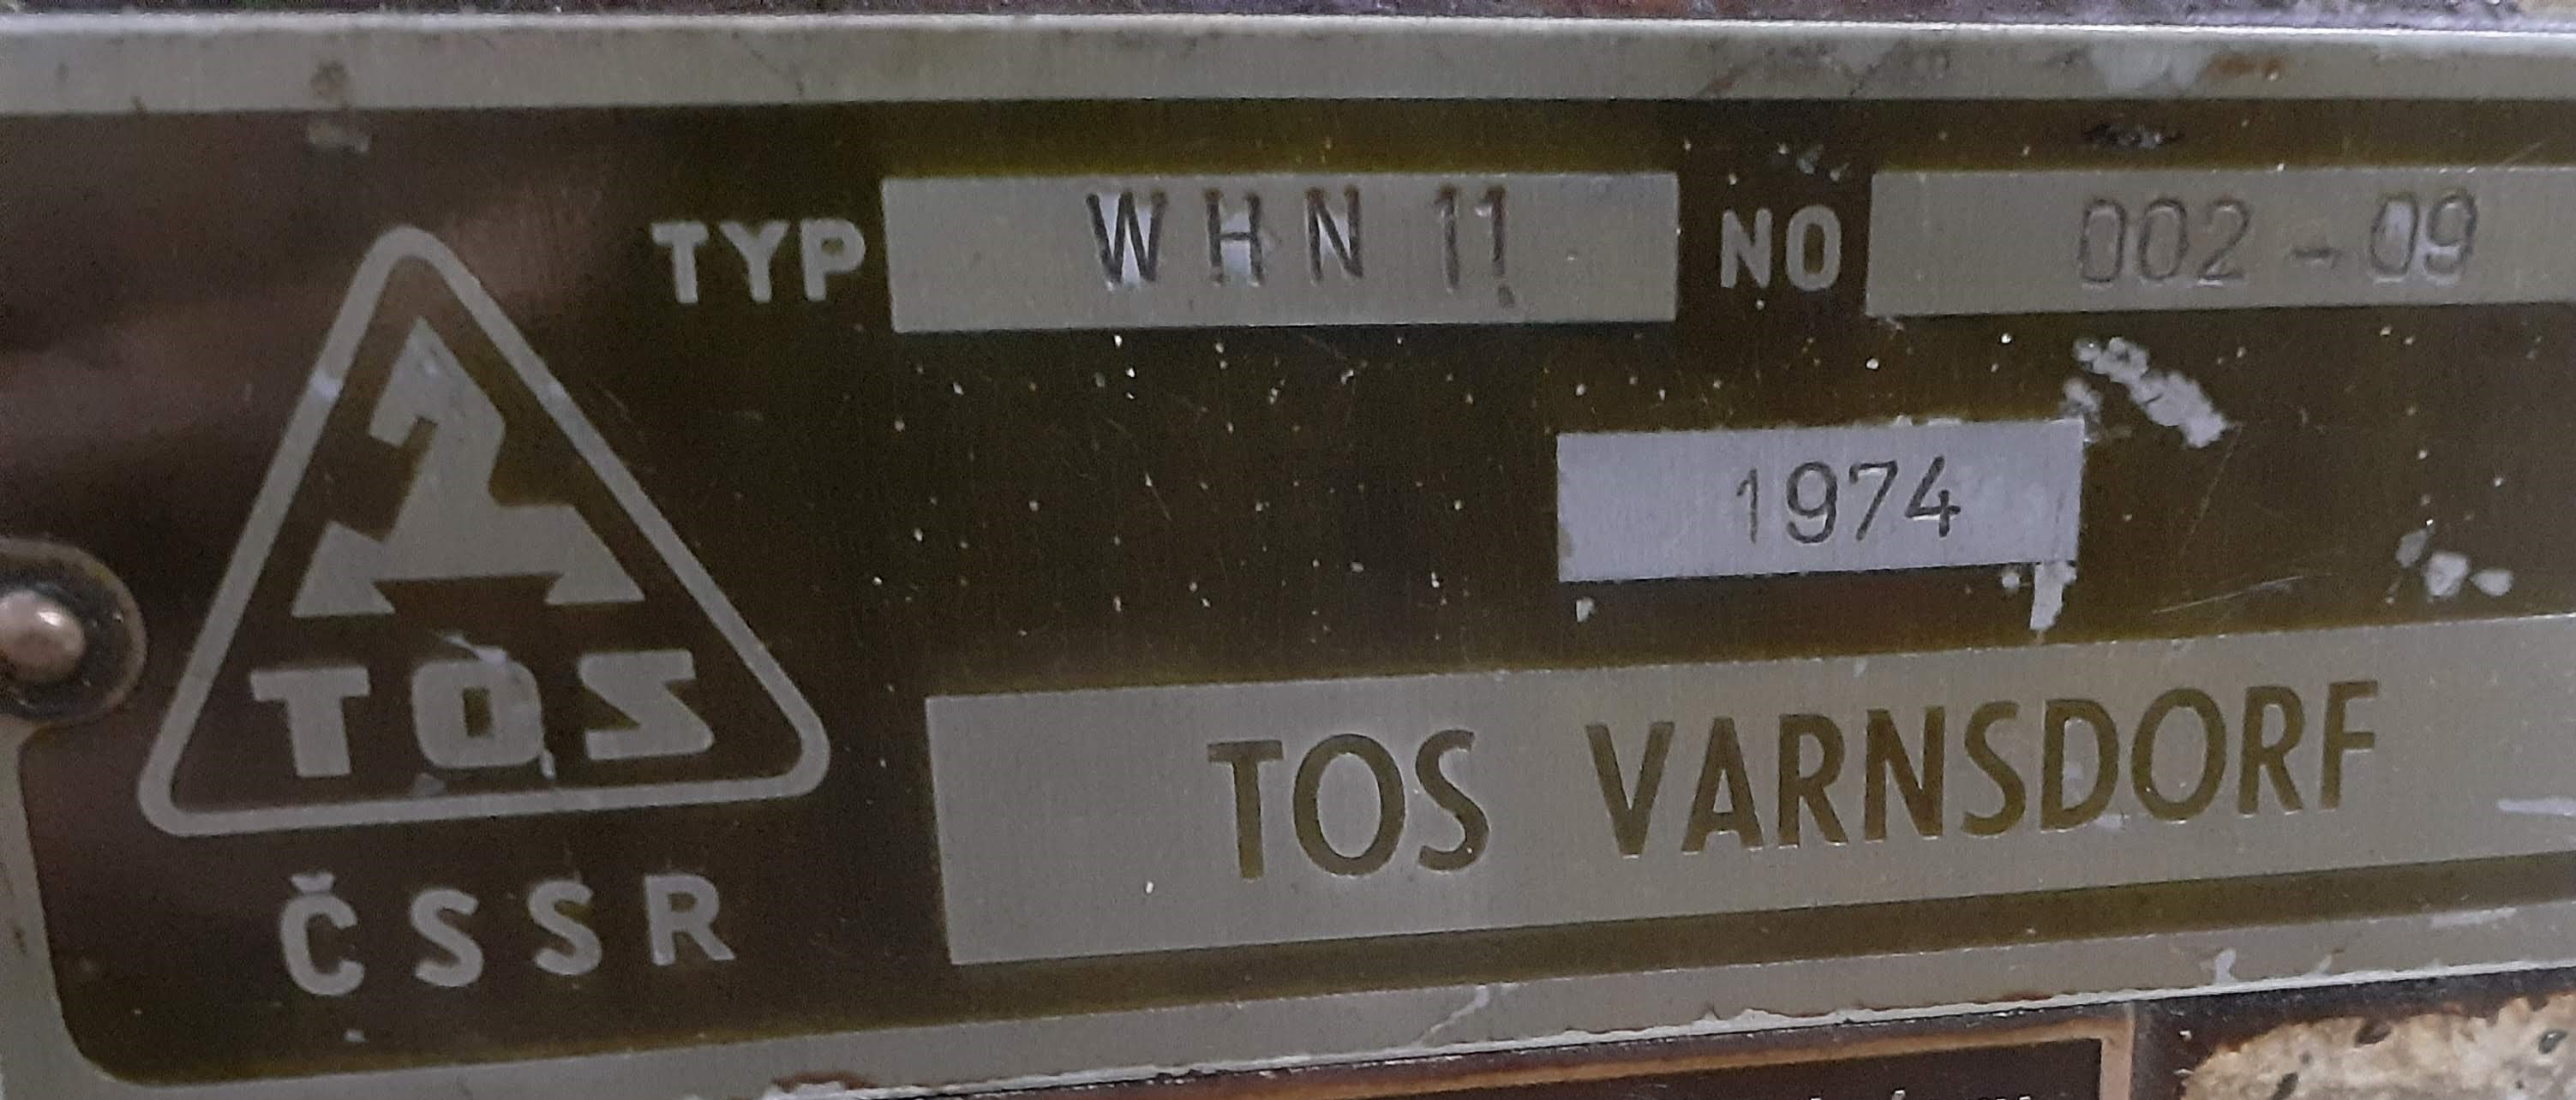 5196-whn11.16